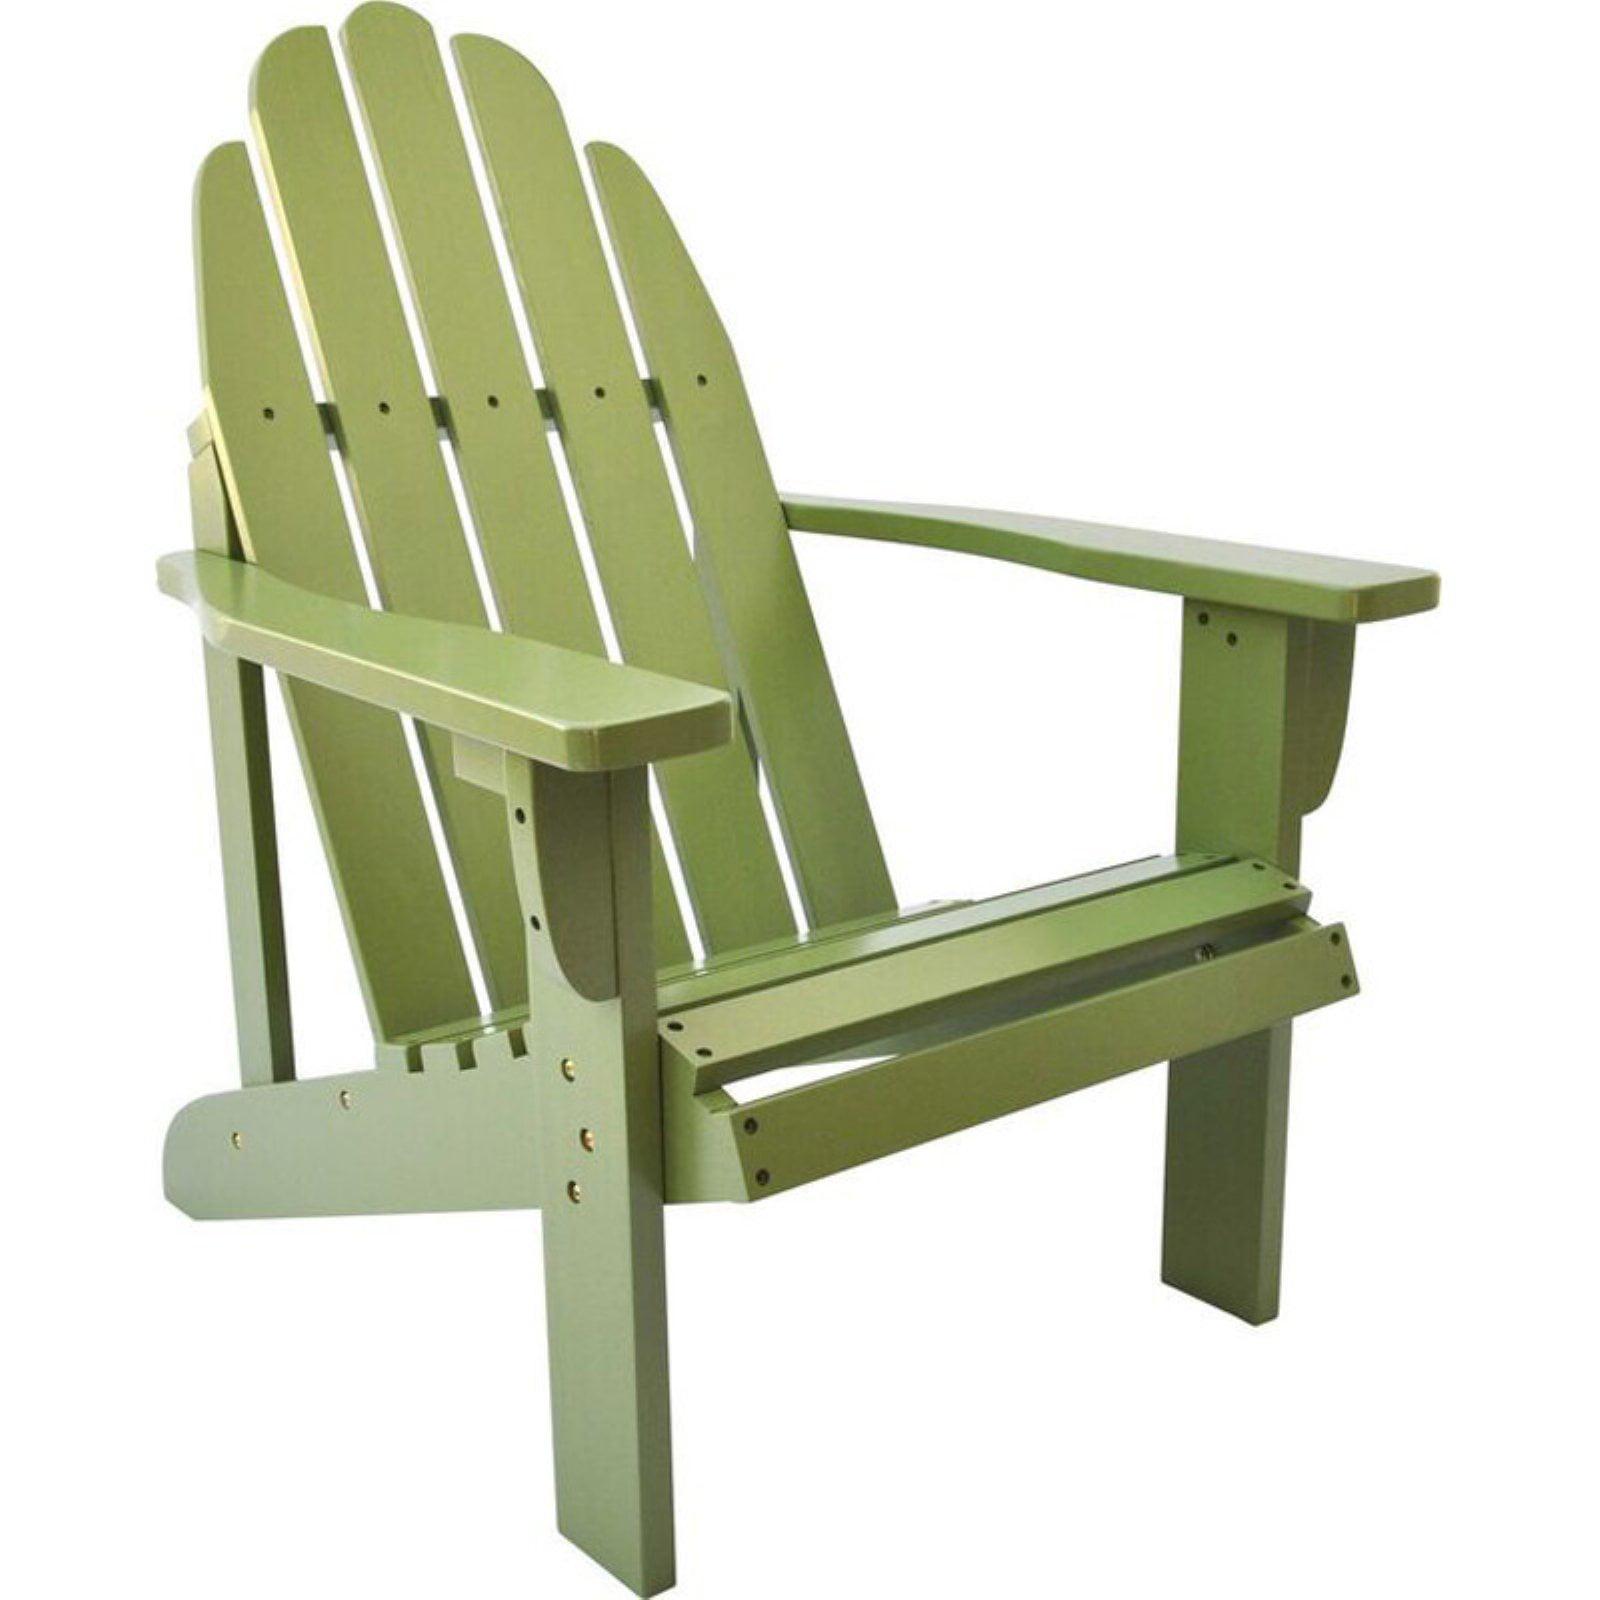 Shine Company Catalina Adirondack Chair - Leap Frog